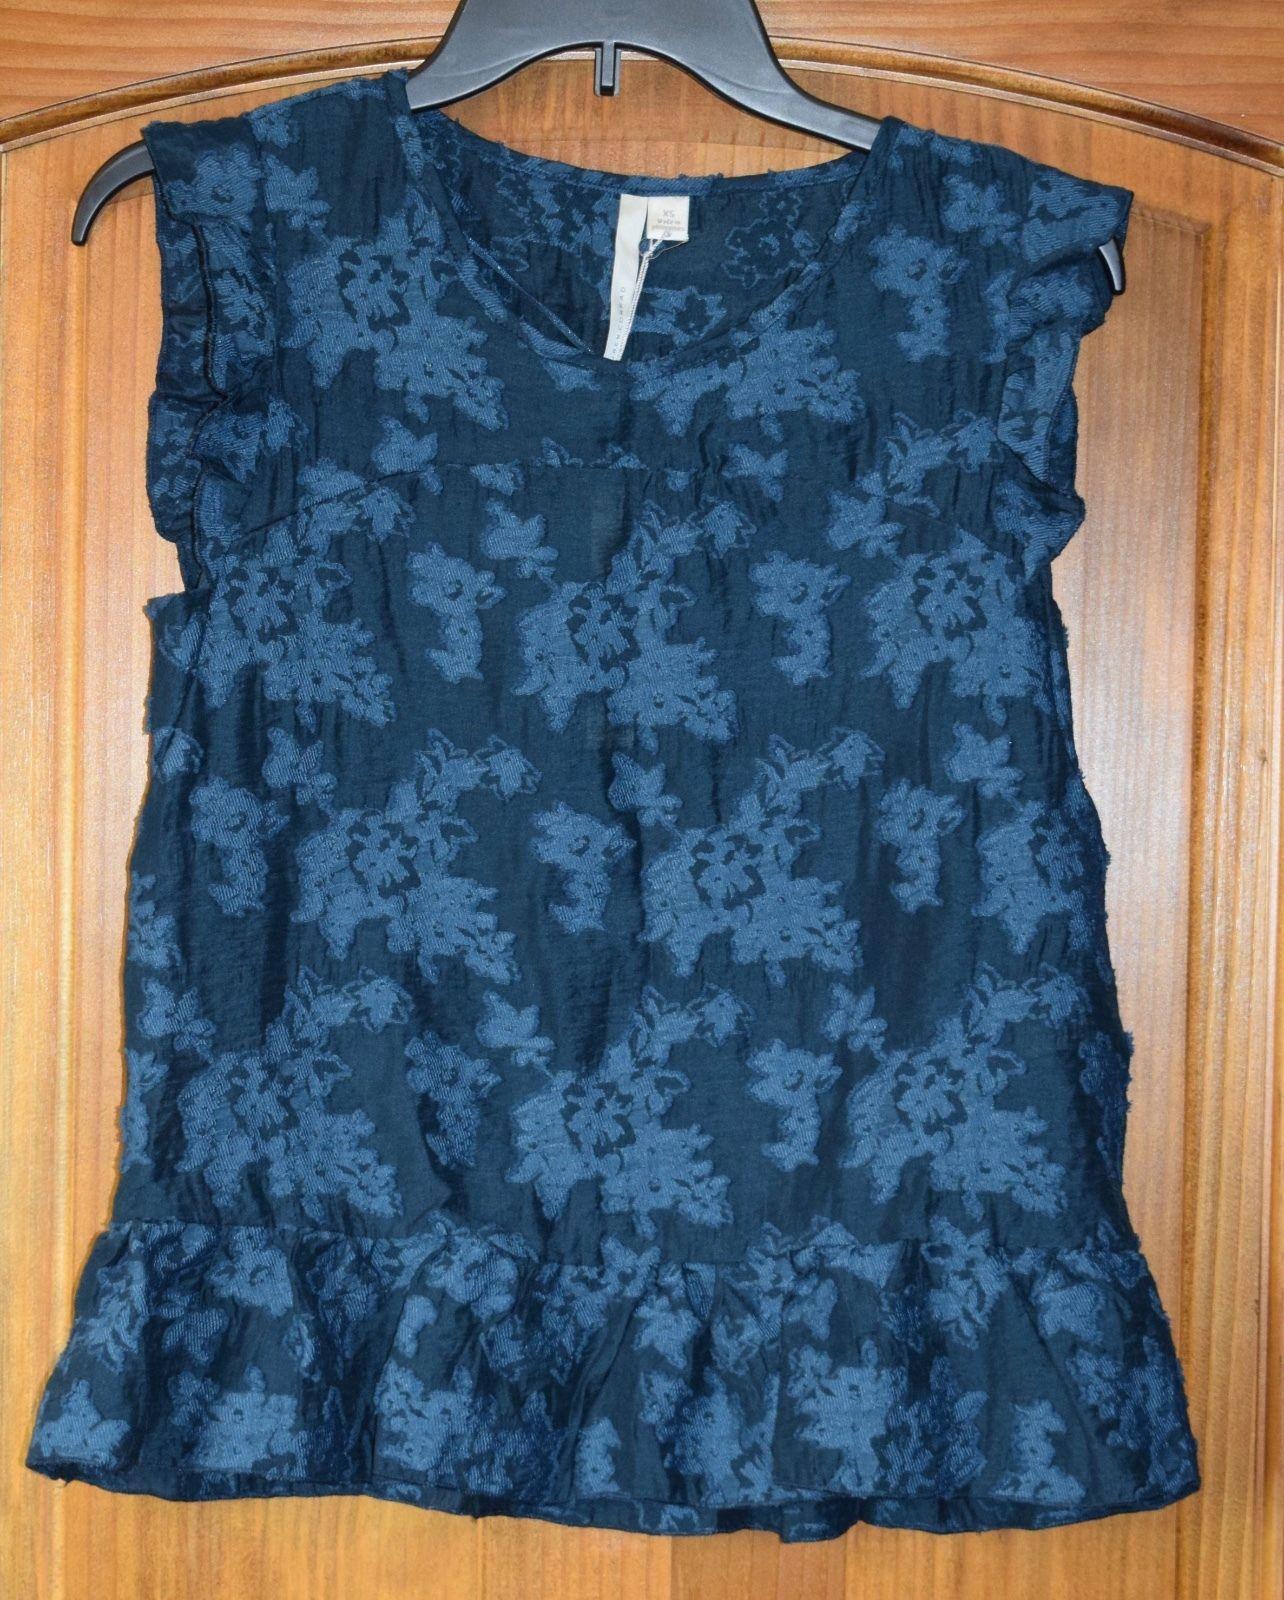 2bfa53fcd0e036 S l1600. S l1600. New LC Lauren Conrad XS Jacquard Shell Teal Sleeveless  Floral Lace Ruffle Top